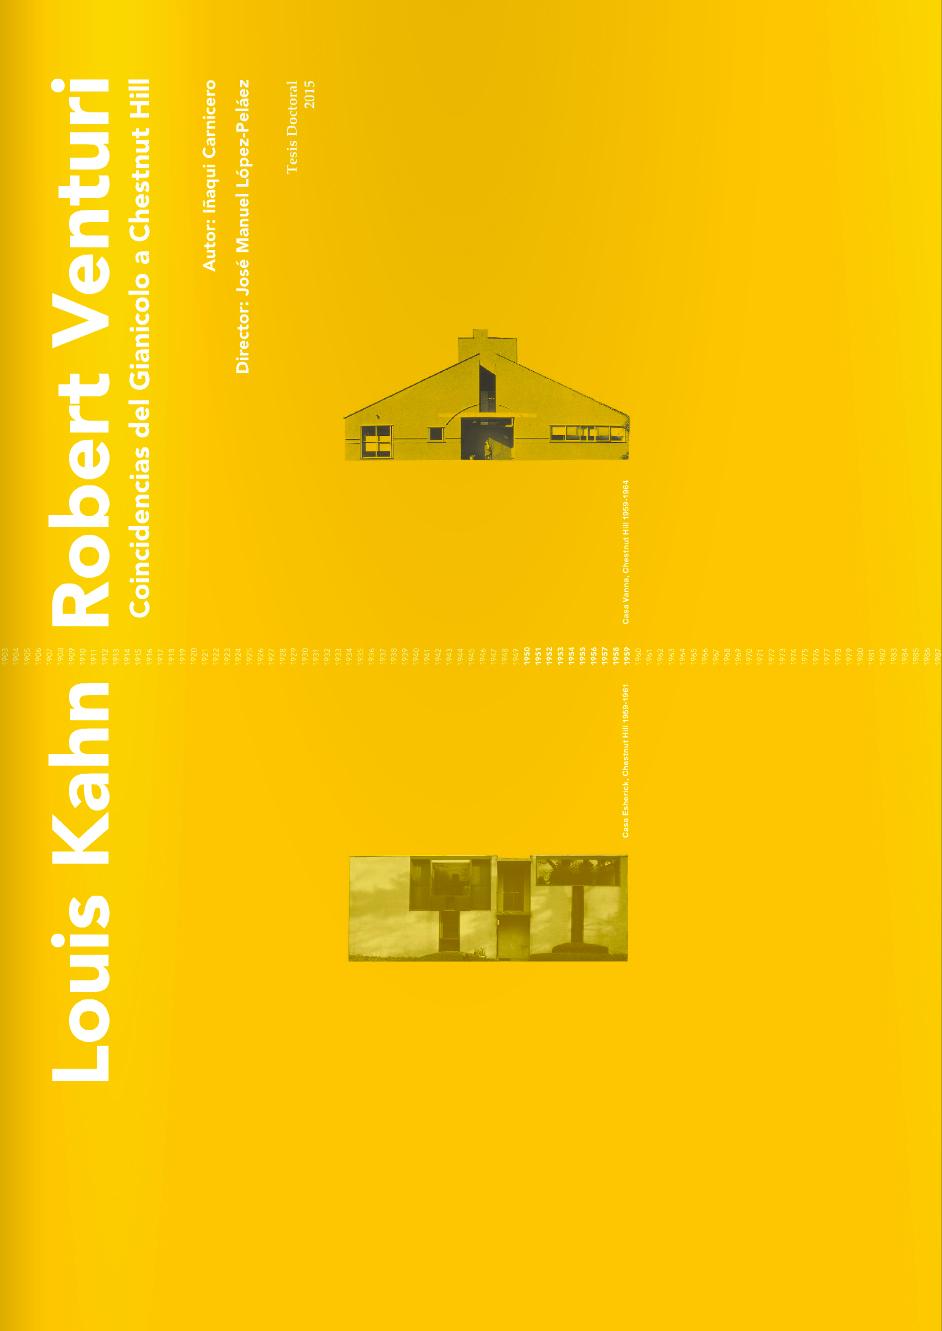 Louis Kahn, Robert Venturi: Coincidences. From Gianicolo to Chestnut Hill